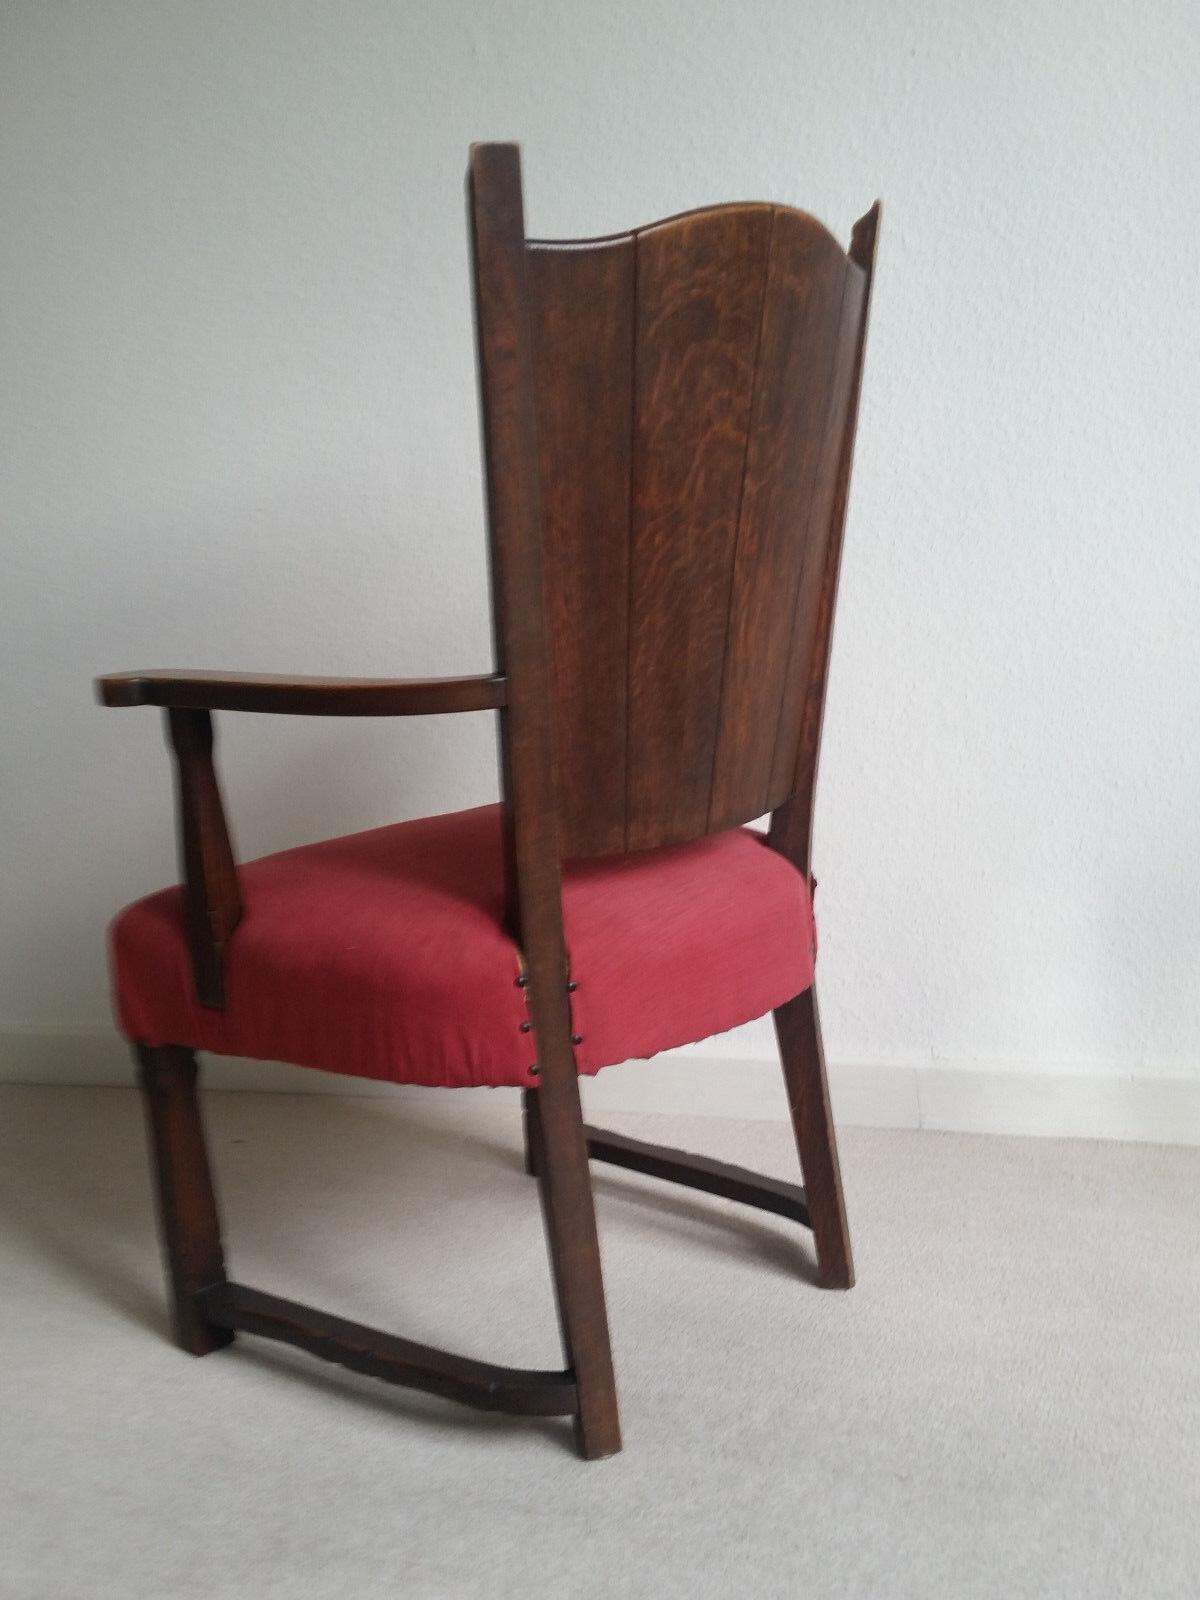 antiker polstersessel sessel stuhl b rostuhl aus den 20er 30er jahren eiche eur 149 00. Black Bedroom Furniture Sets. Home Design Ideas